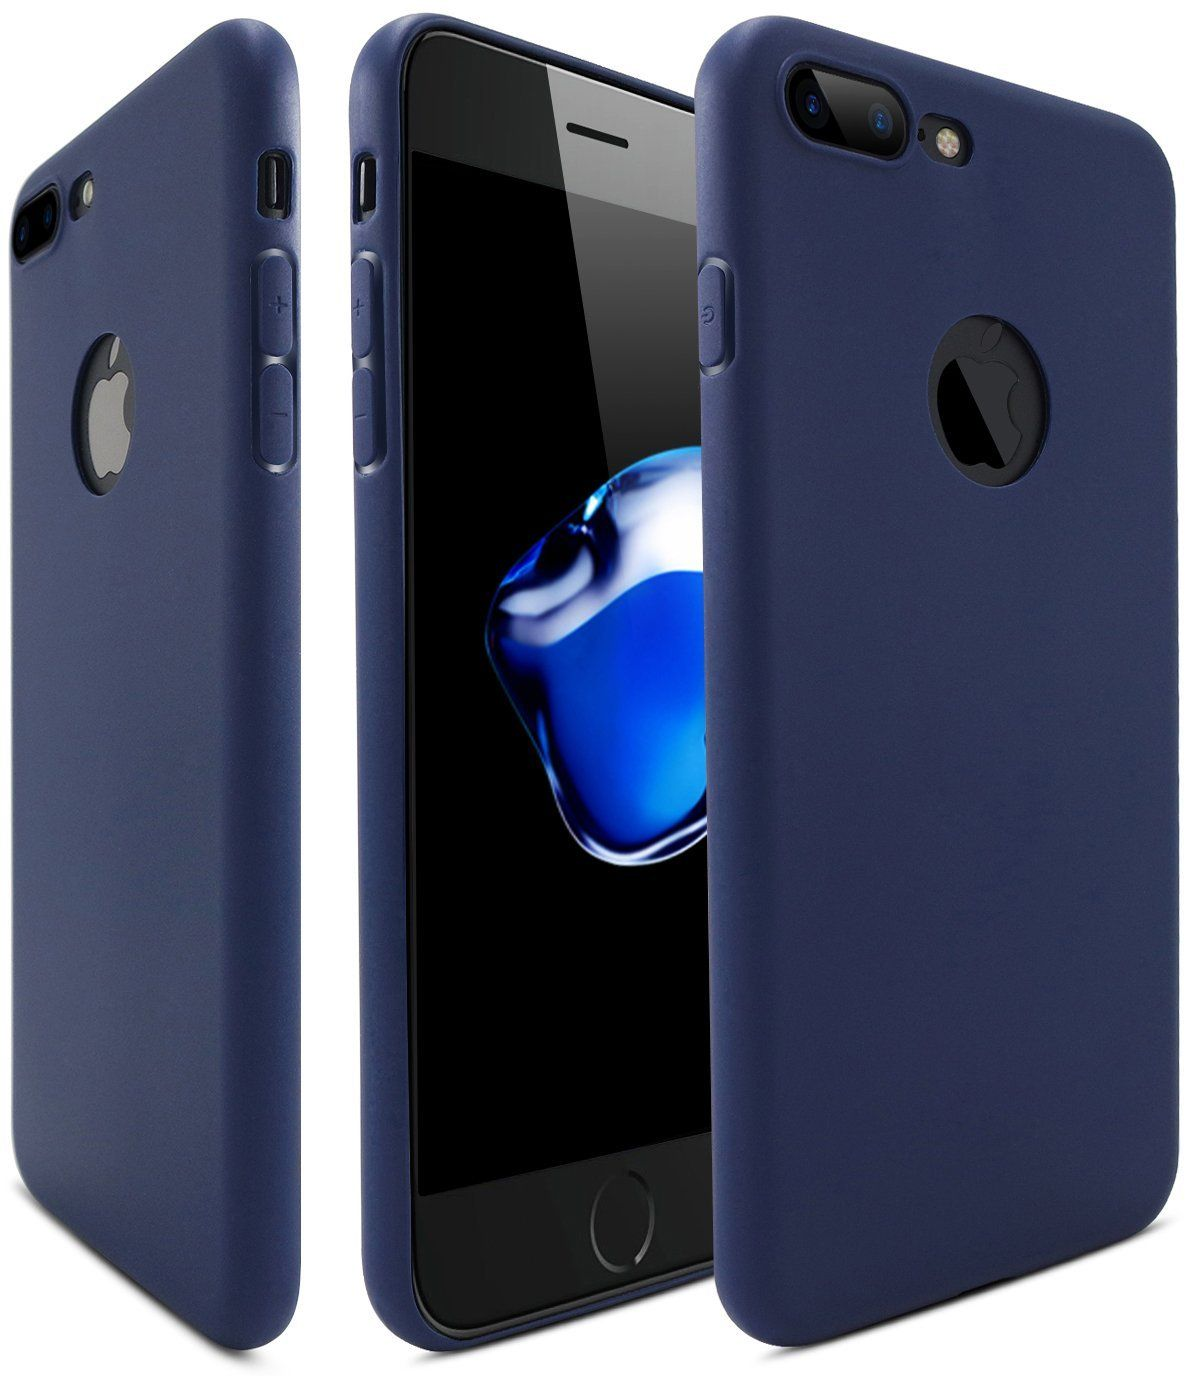 IPhone 7 Plus Case, HZ BIGTREE Ultra-Thin TPU Soft